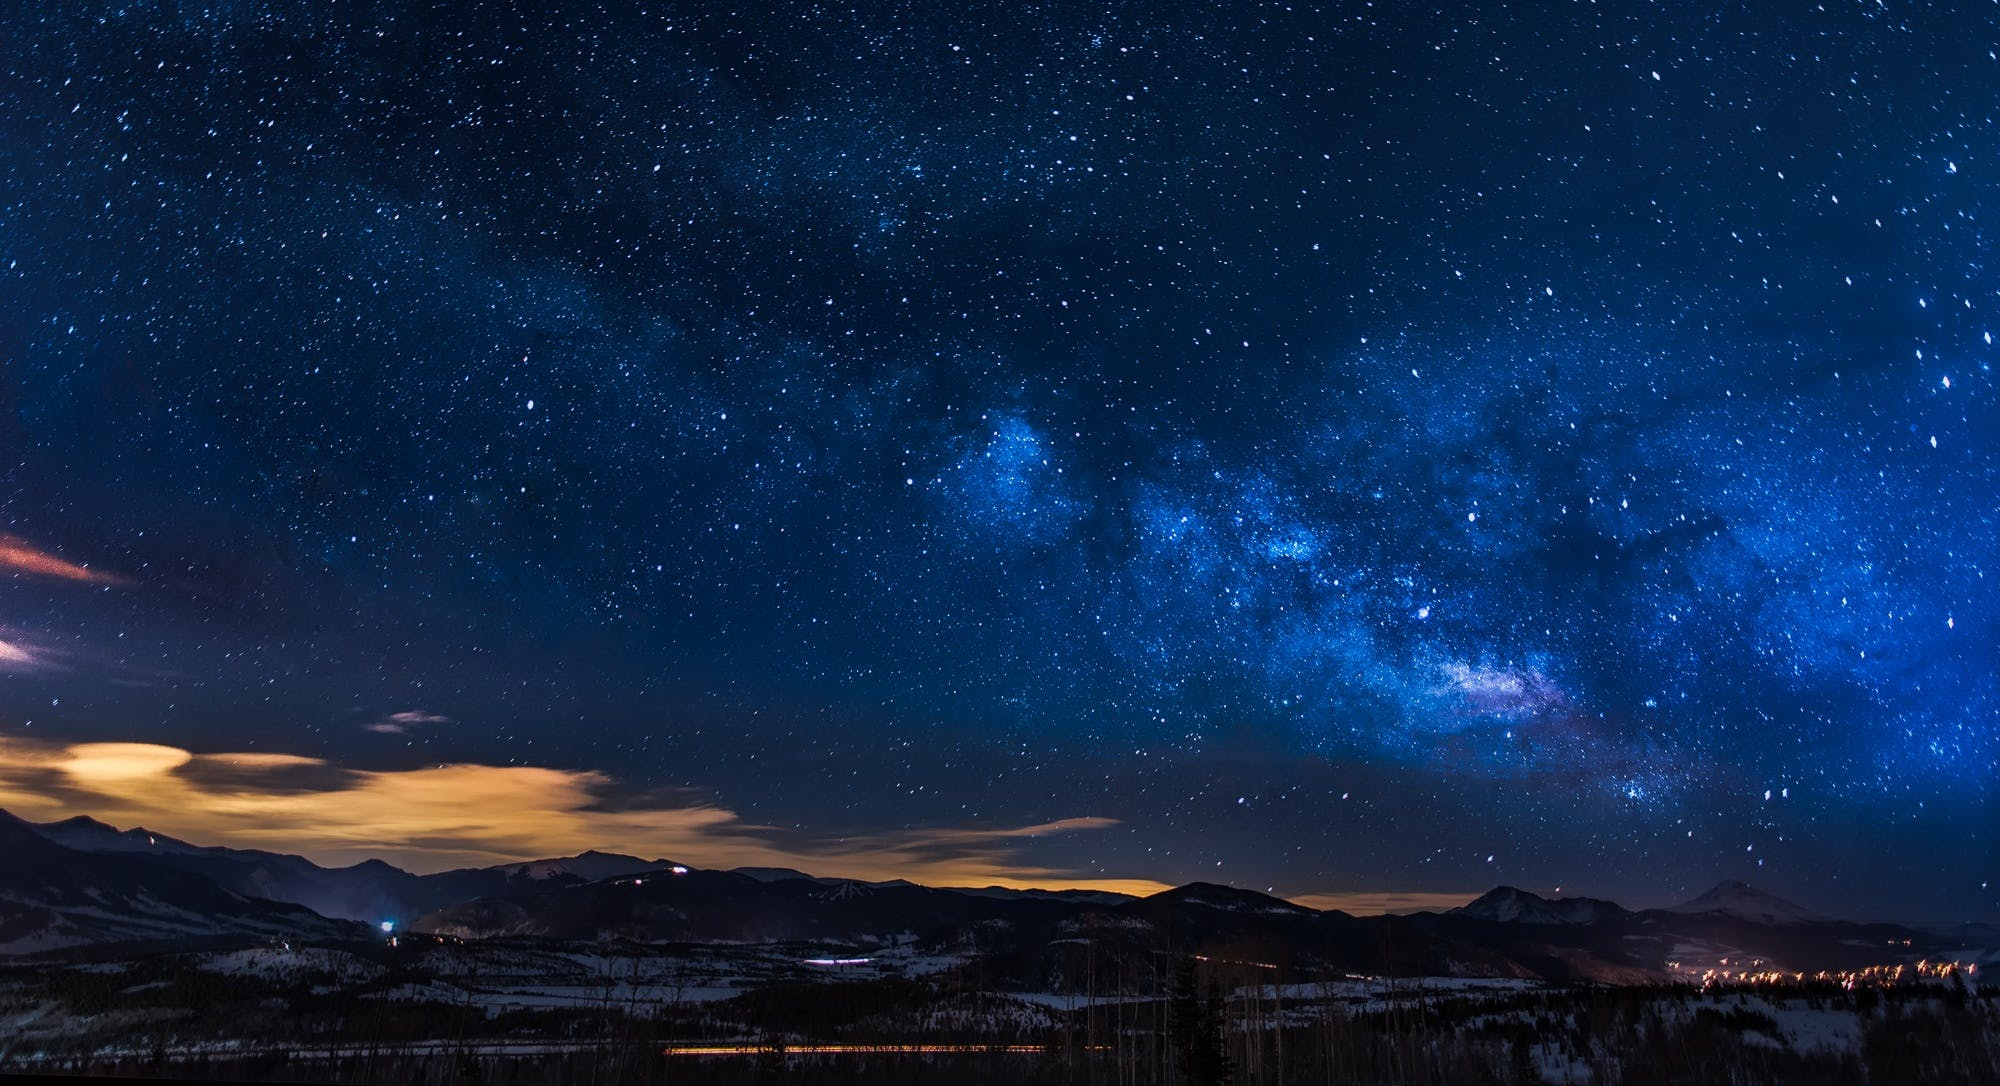 abend, astronomie, berge